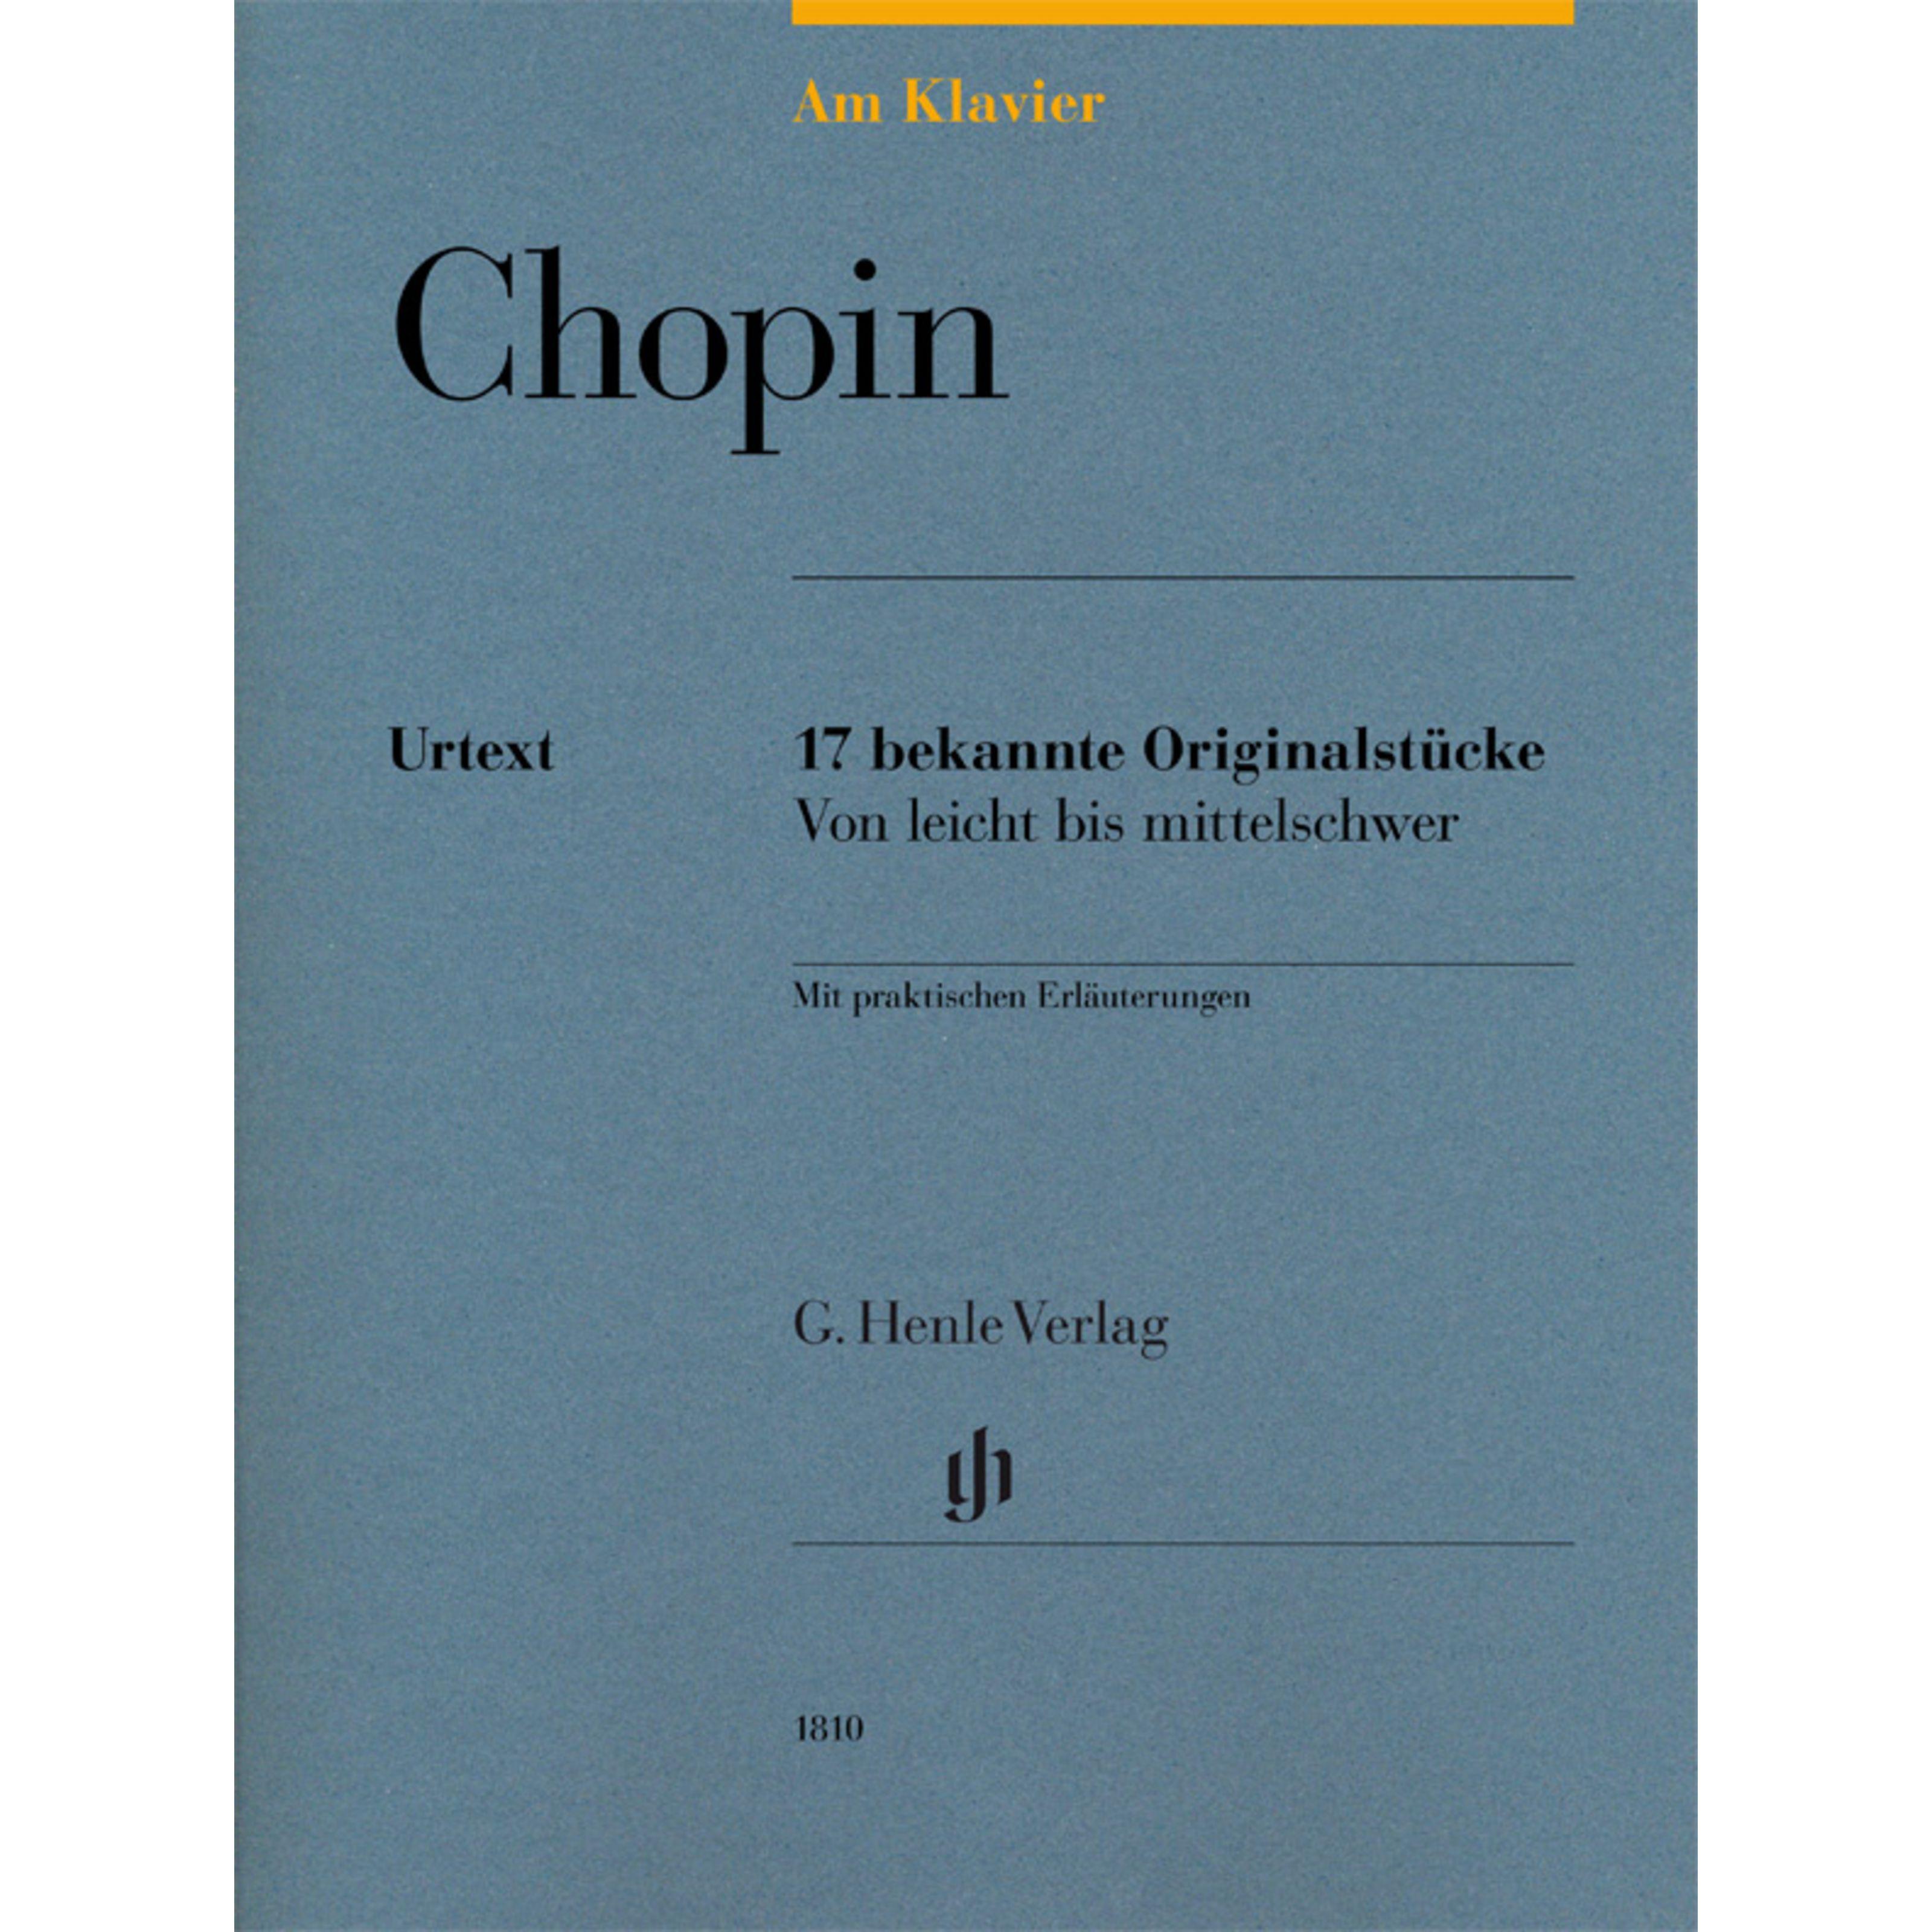 Henle Verlag - Frederic Chopin: Am Klavier HN 1810